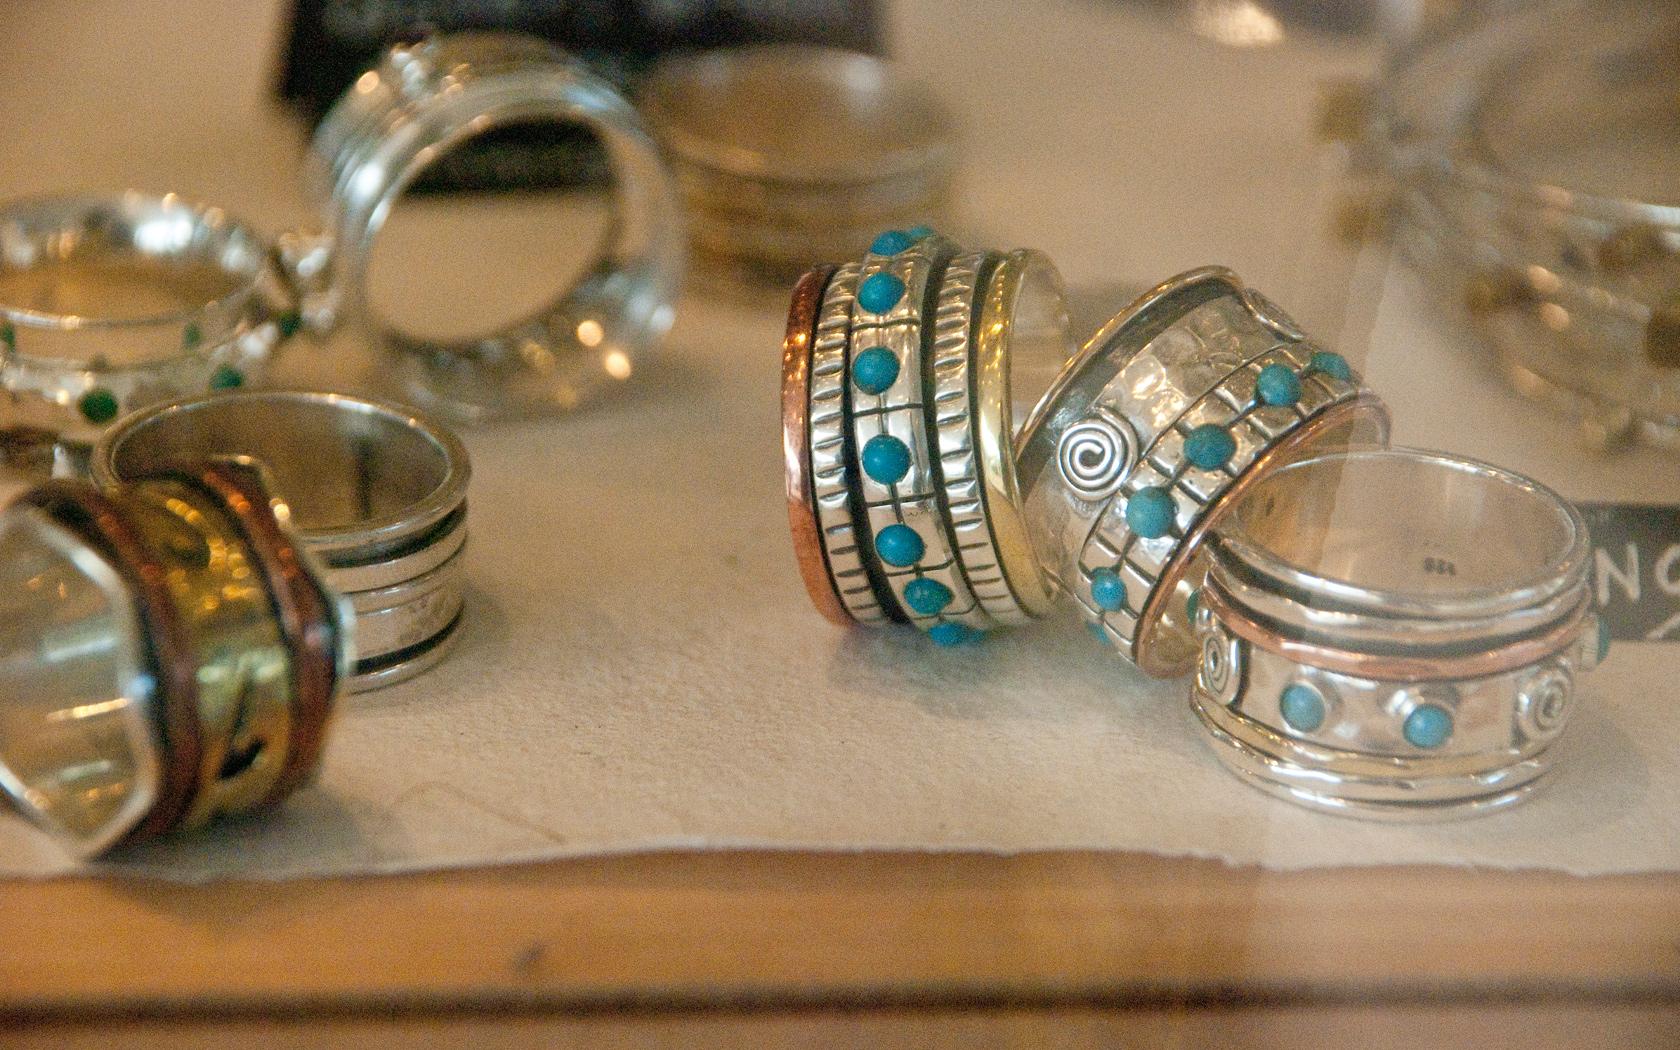 fifth element jewellers totnes bespoke contemporary jewellery